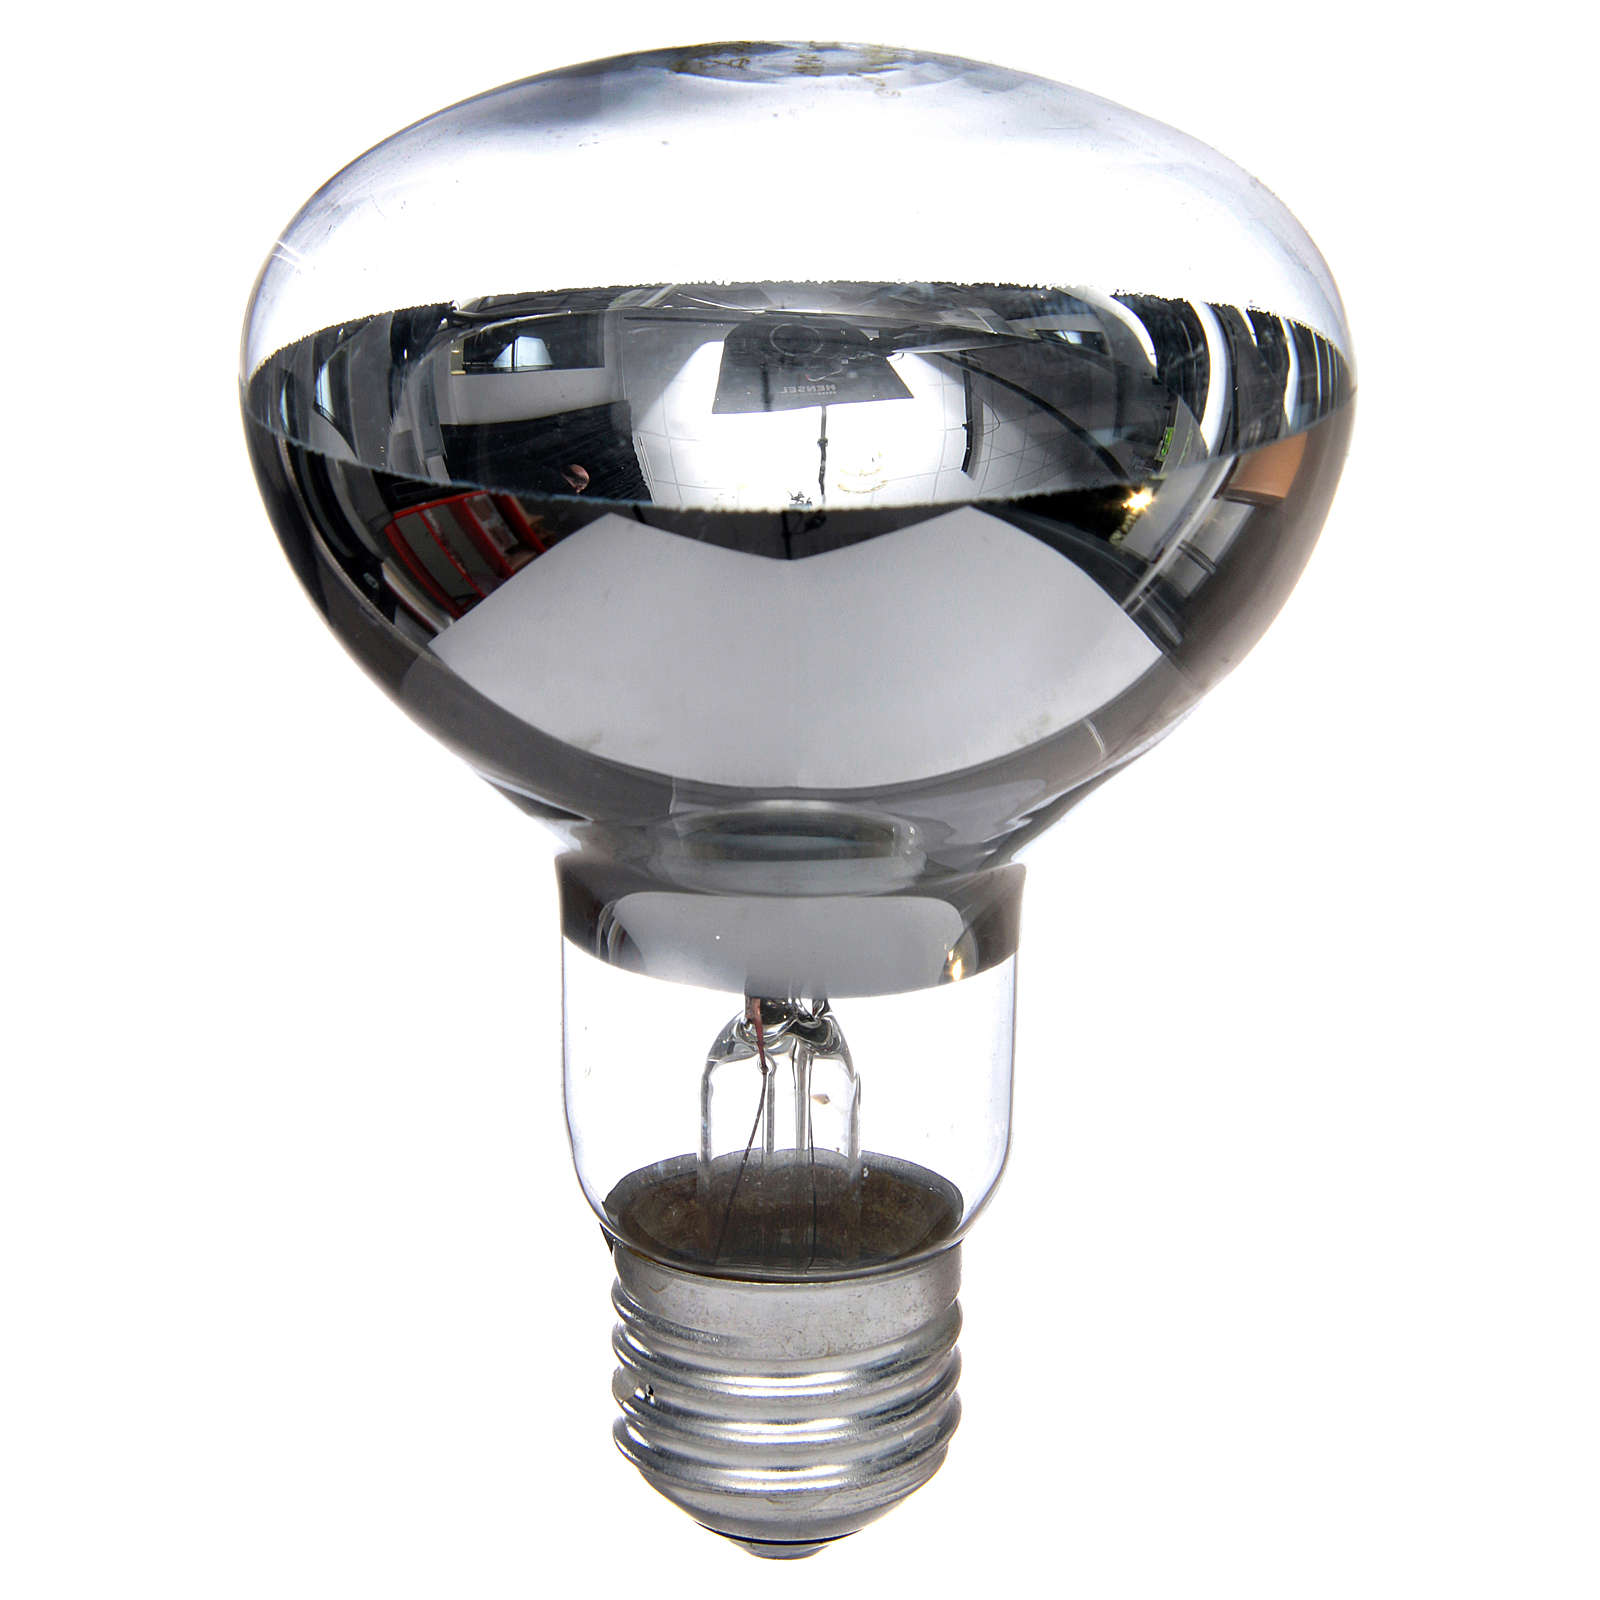 Lampada presepe E27 bianca 220v 60w 4